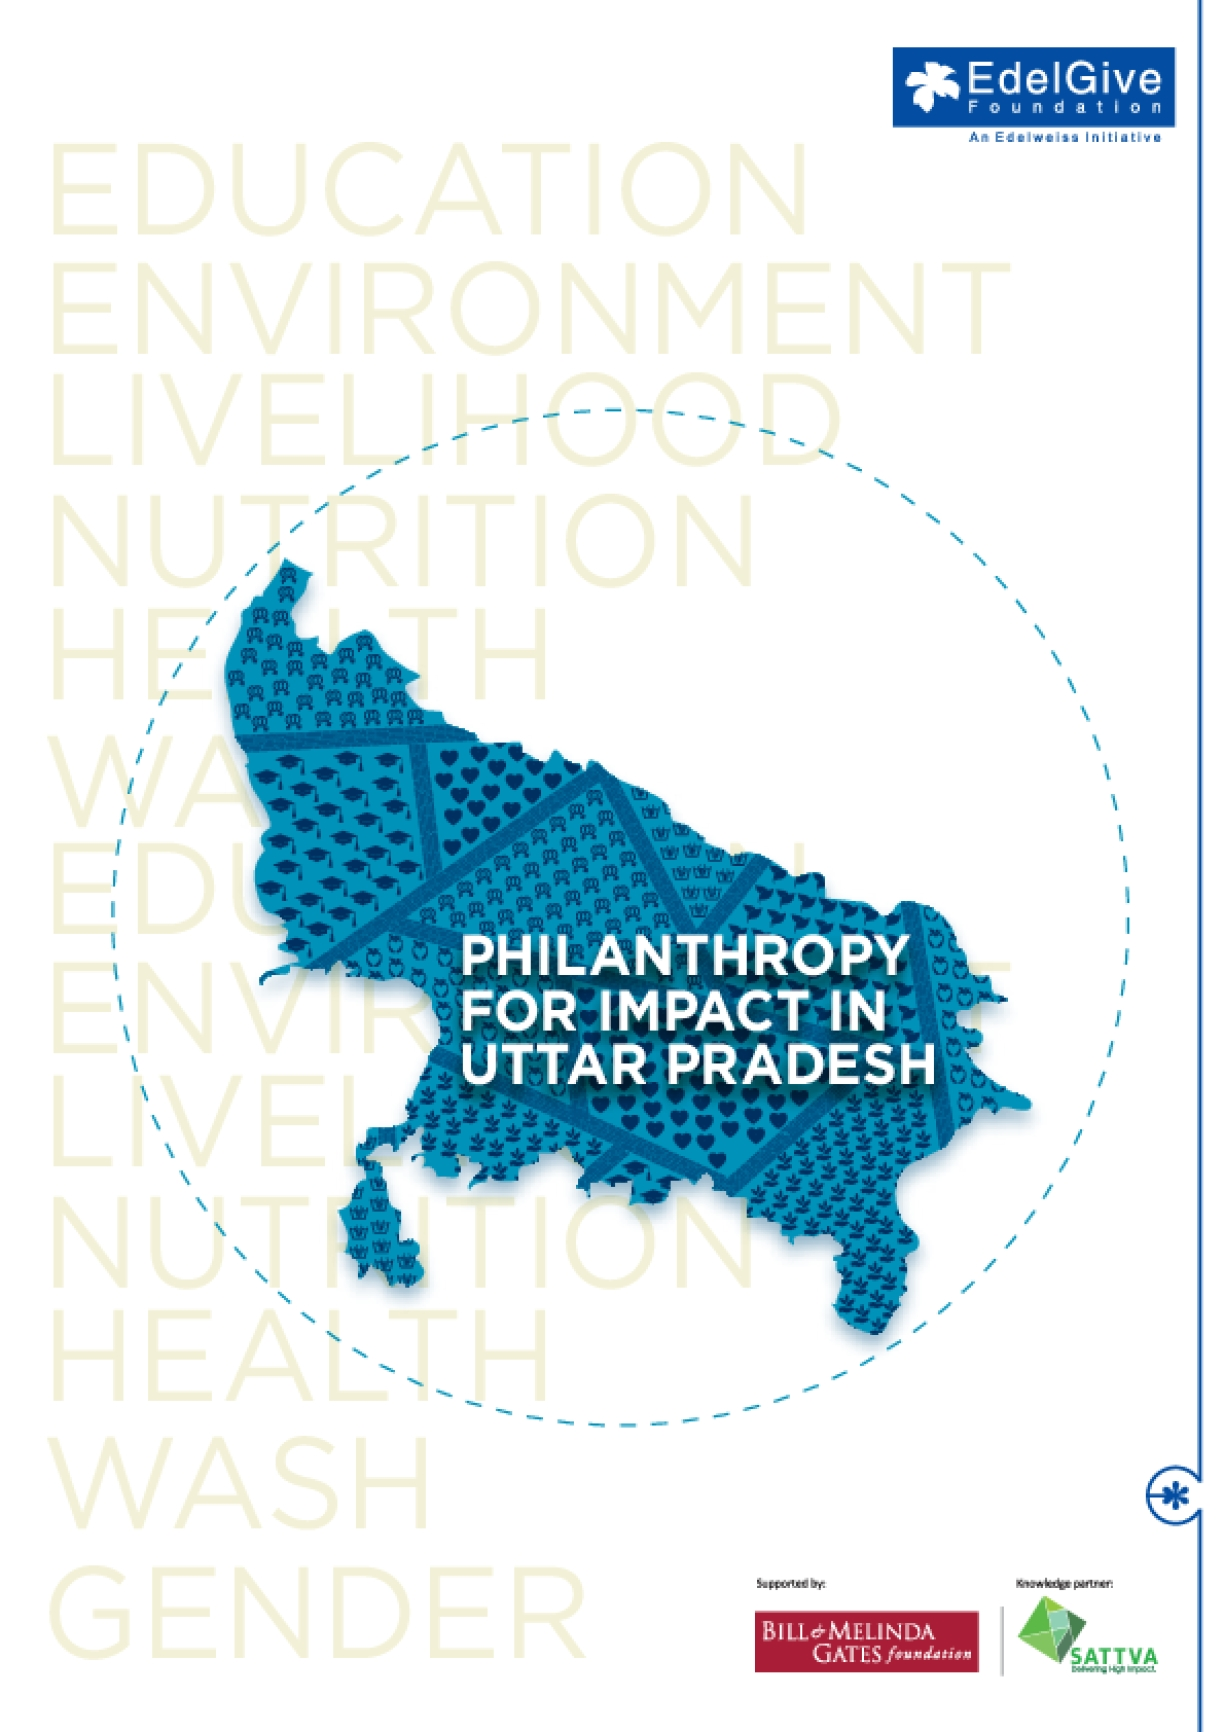 Philanthropy for Impact in Uttar Pradesh